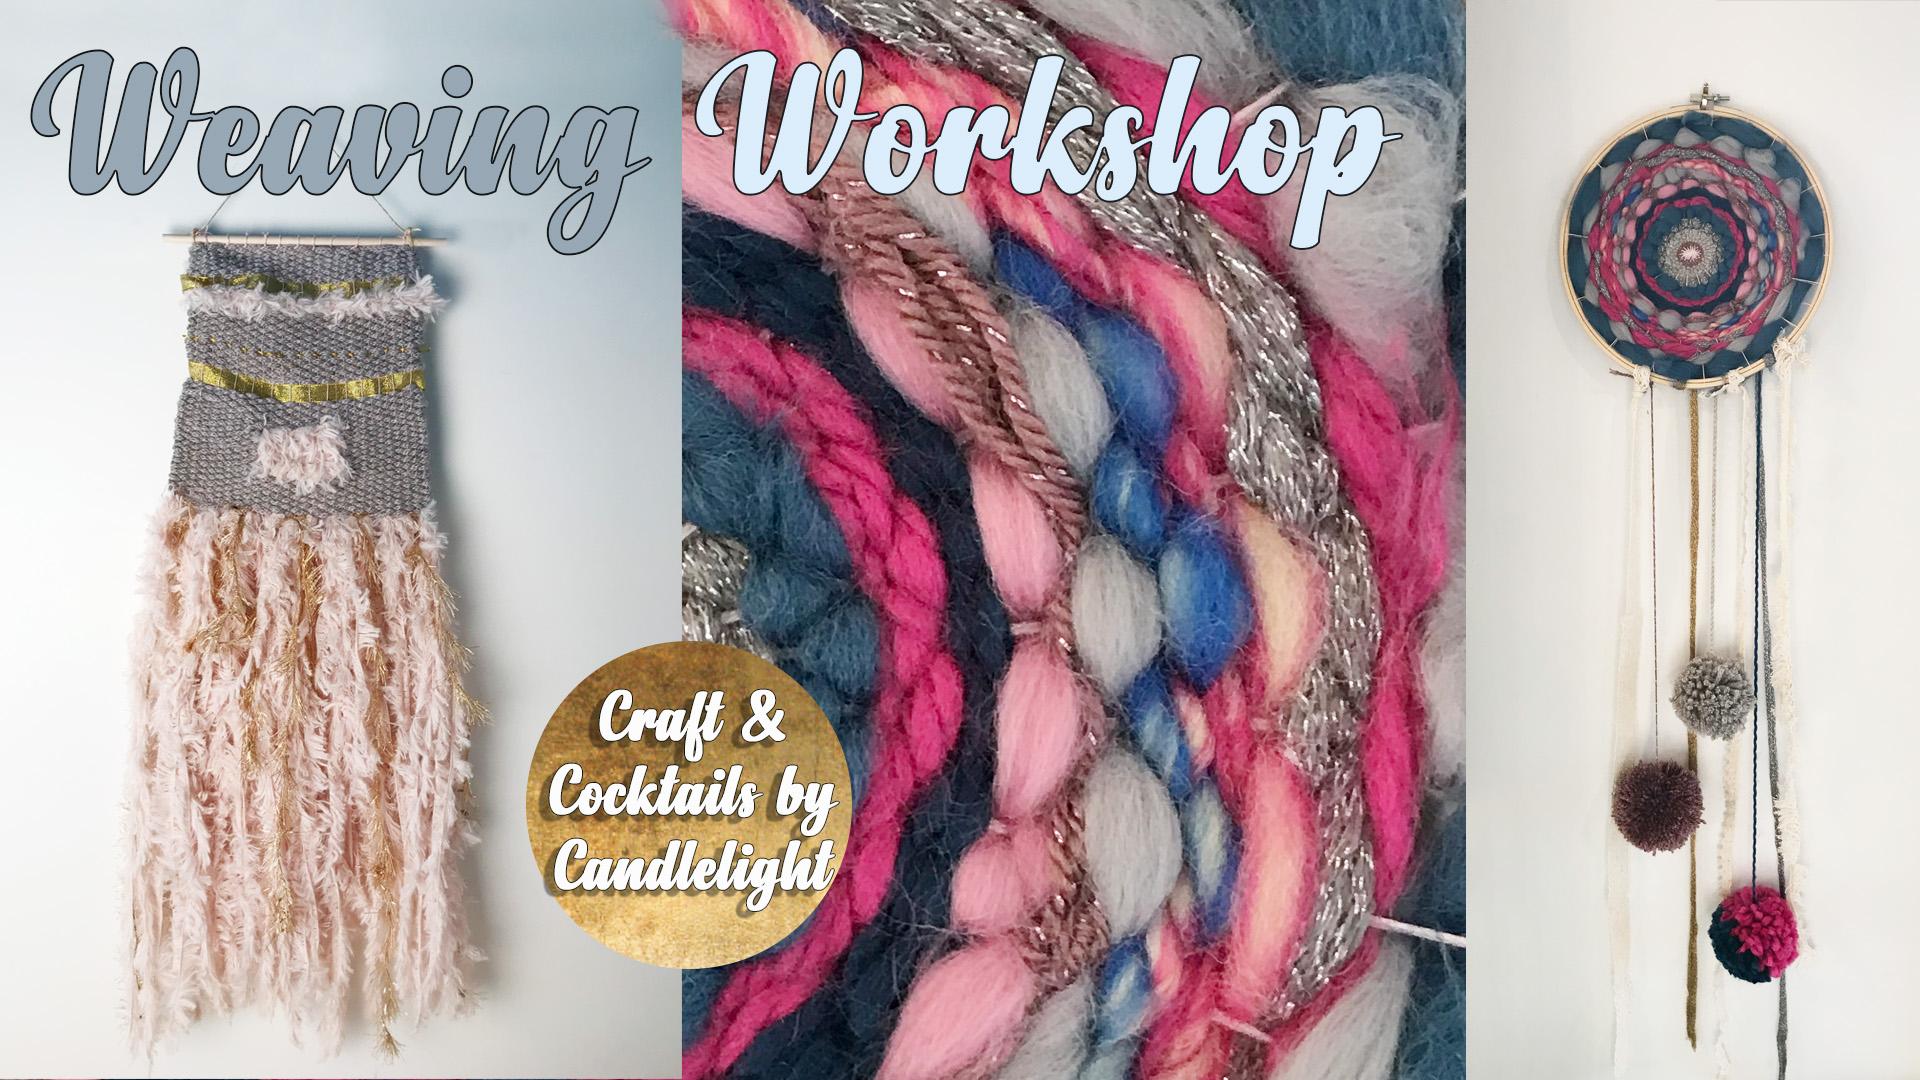 Weavingc